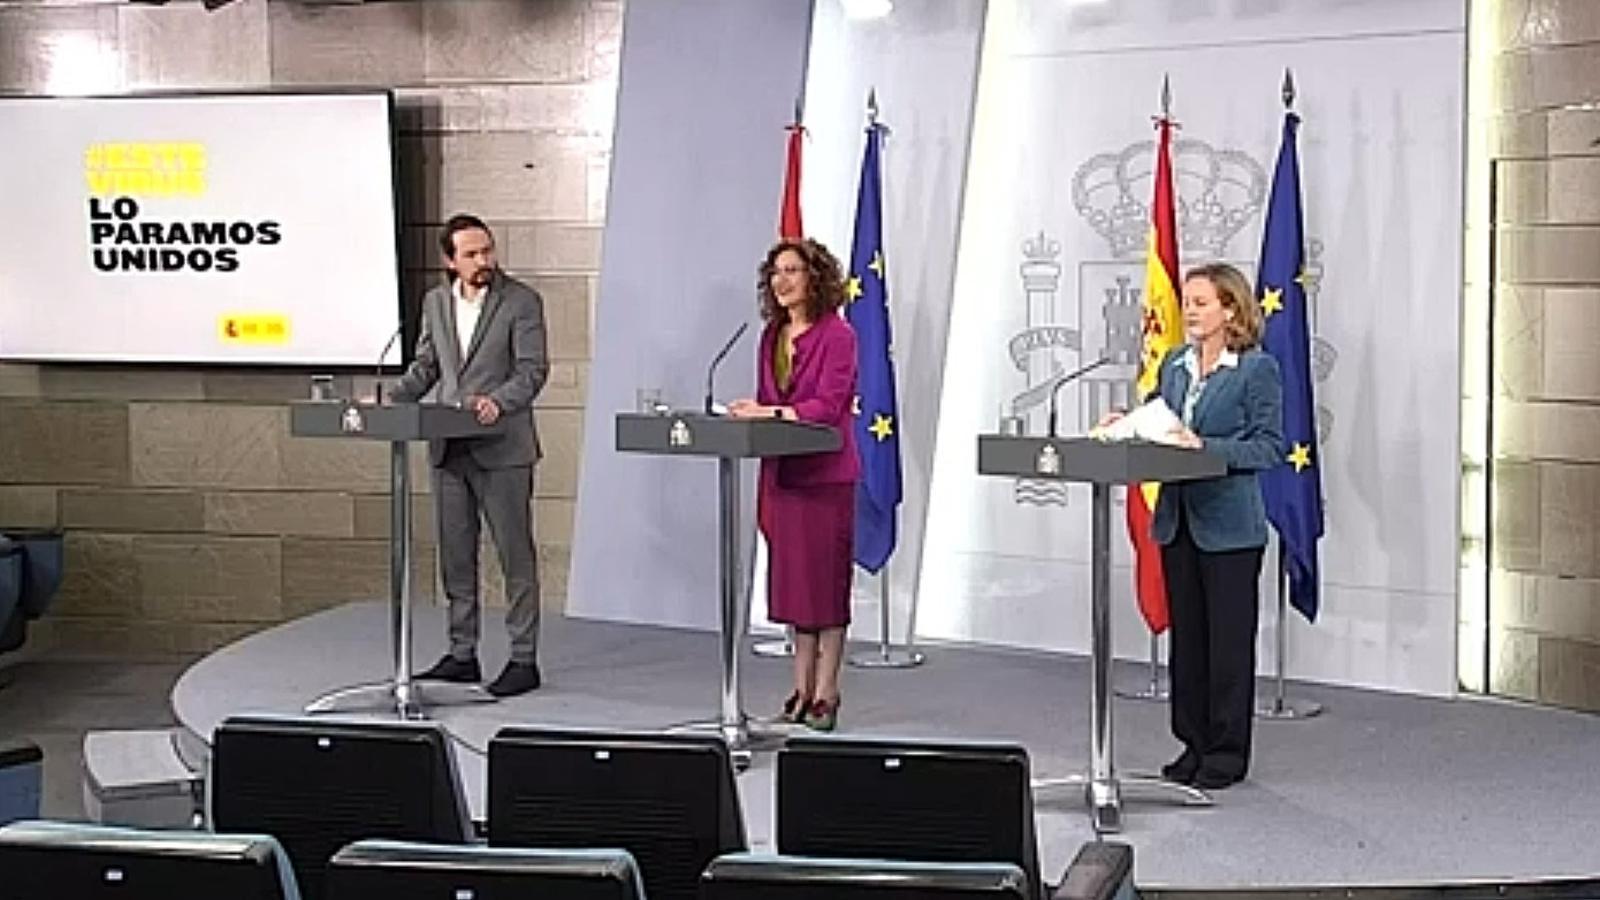 Roda de premsa telemàtica del consell de ministres, amb Pablo Iglesias, María Jesús Montero i Nadia Calviño.